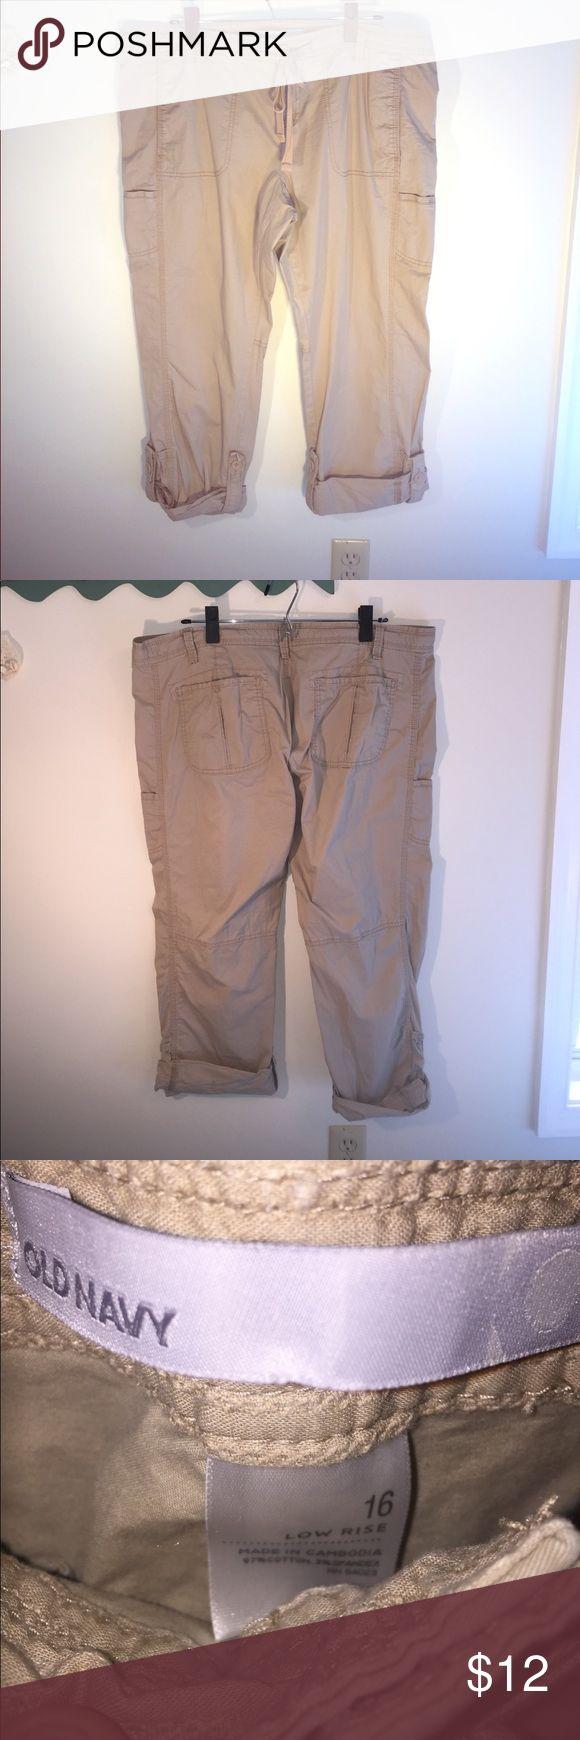 Old Navy Size 16 Low Rose Capri Pants Old Navy Size 16 Low Rose Capri Pants Old Navy Pants Capris